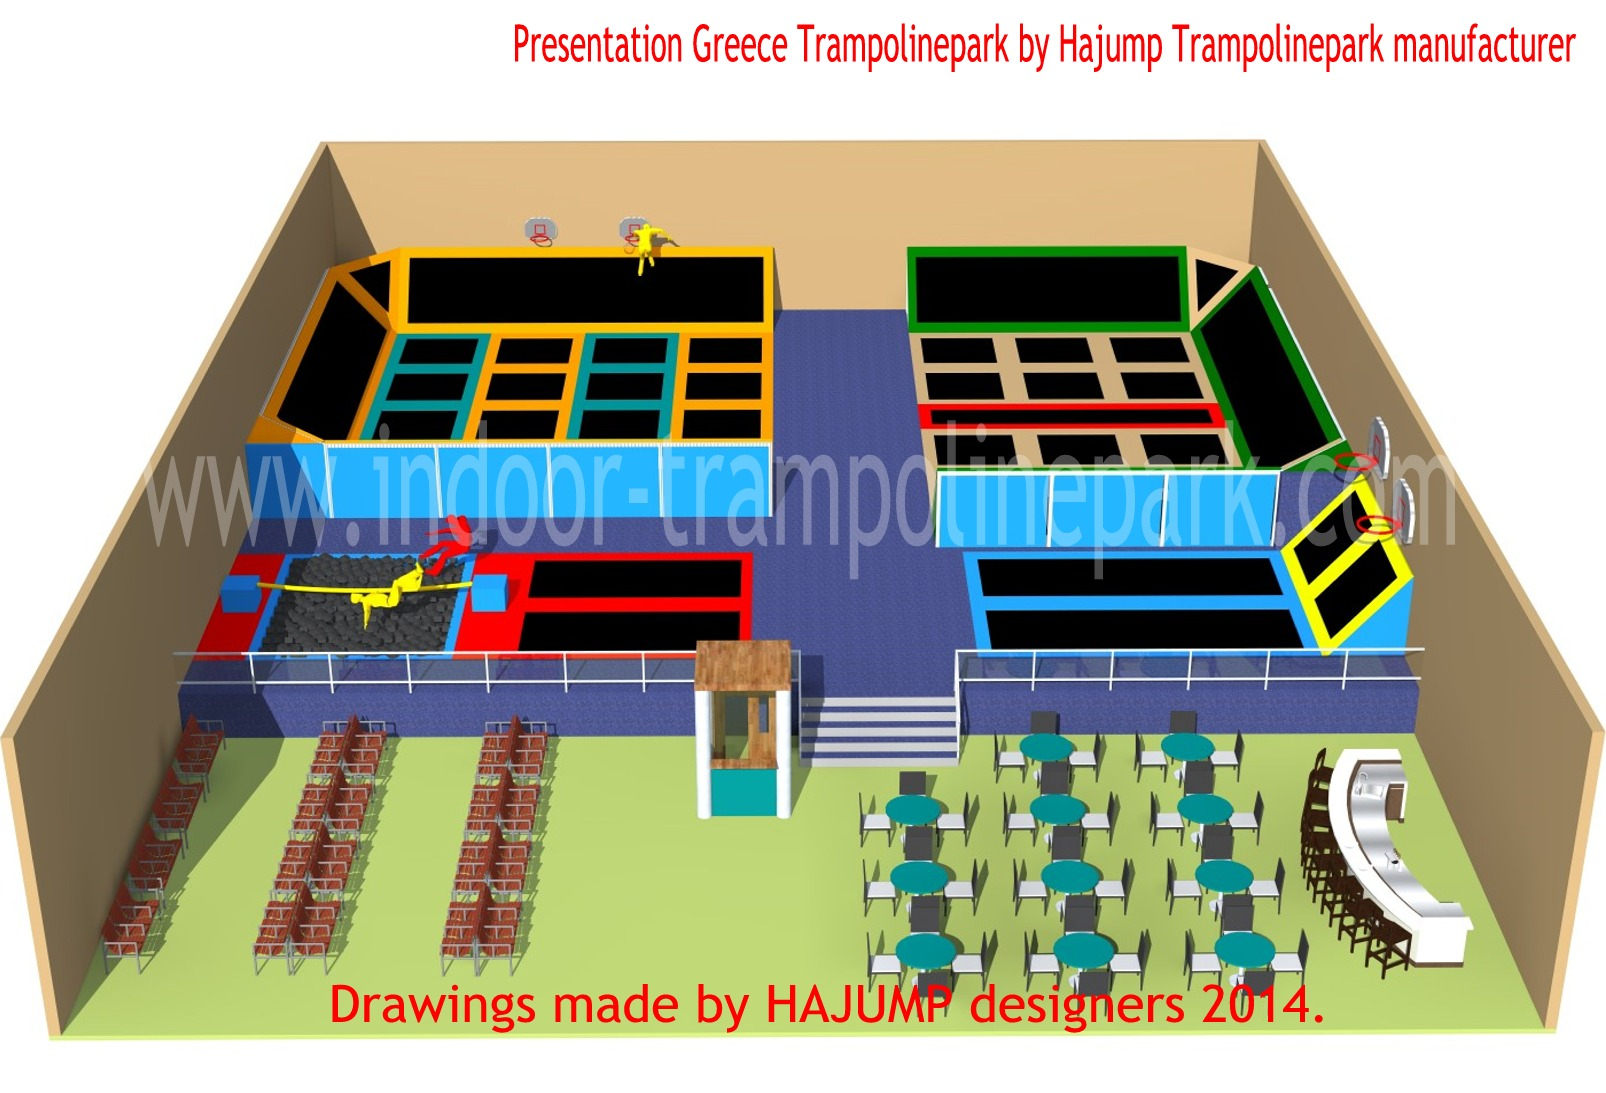 Indoor trampoline park cyprus hajump trampolines for Indoor trampoline park design manufacturing